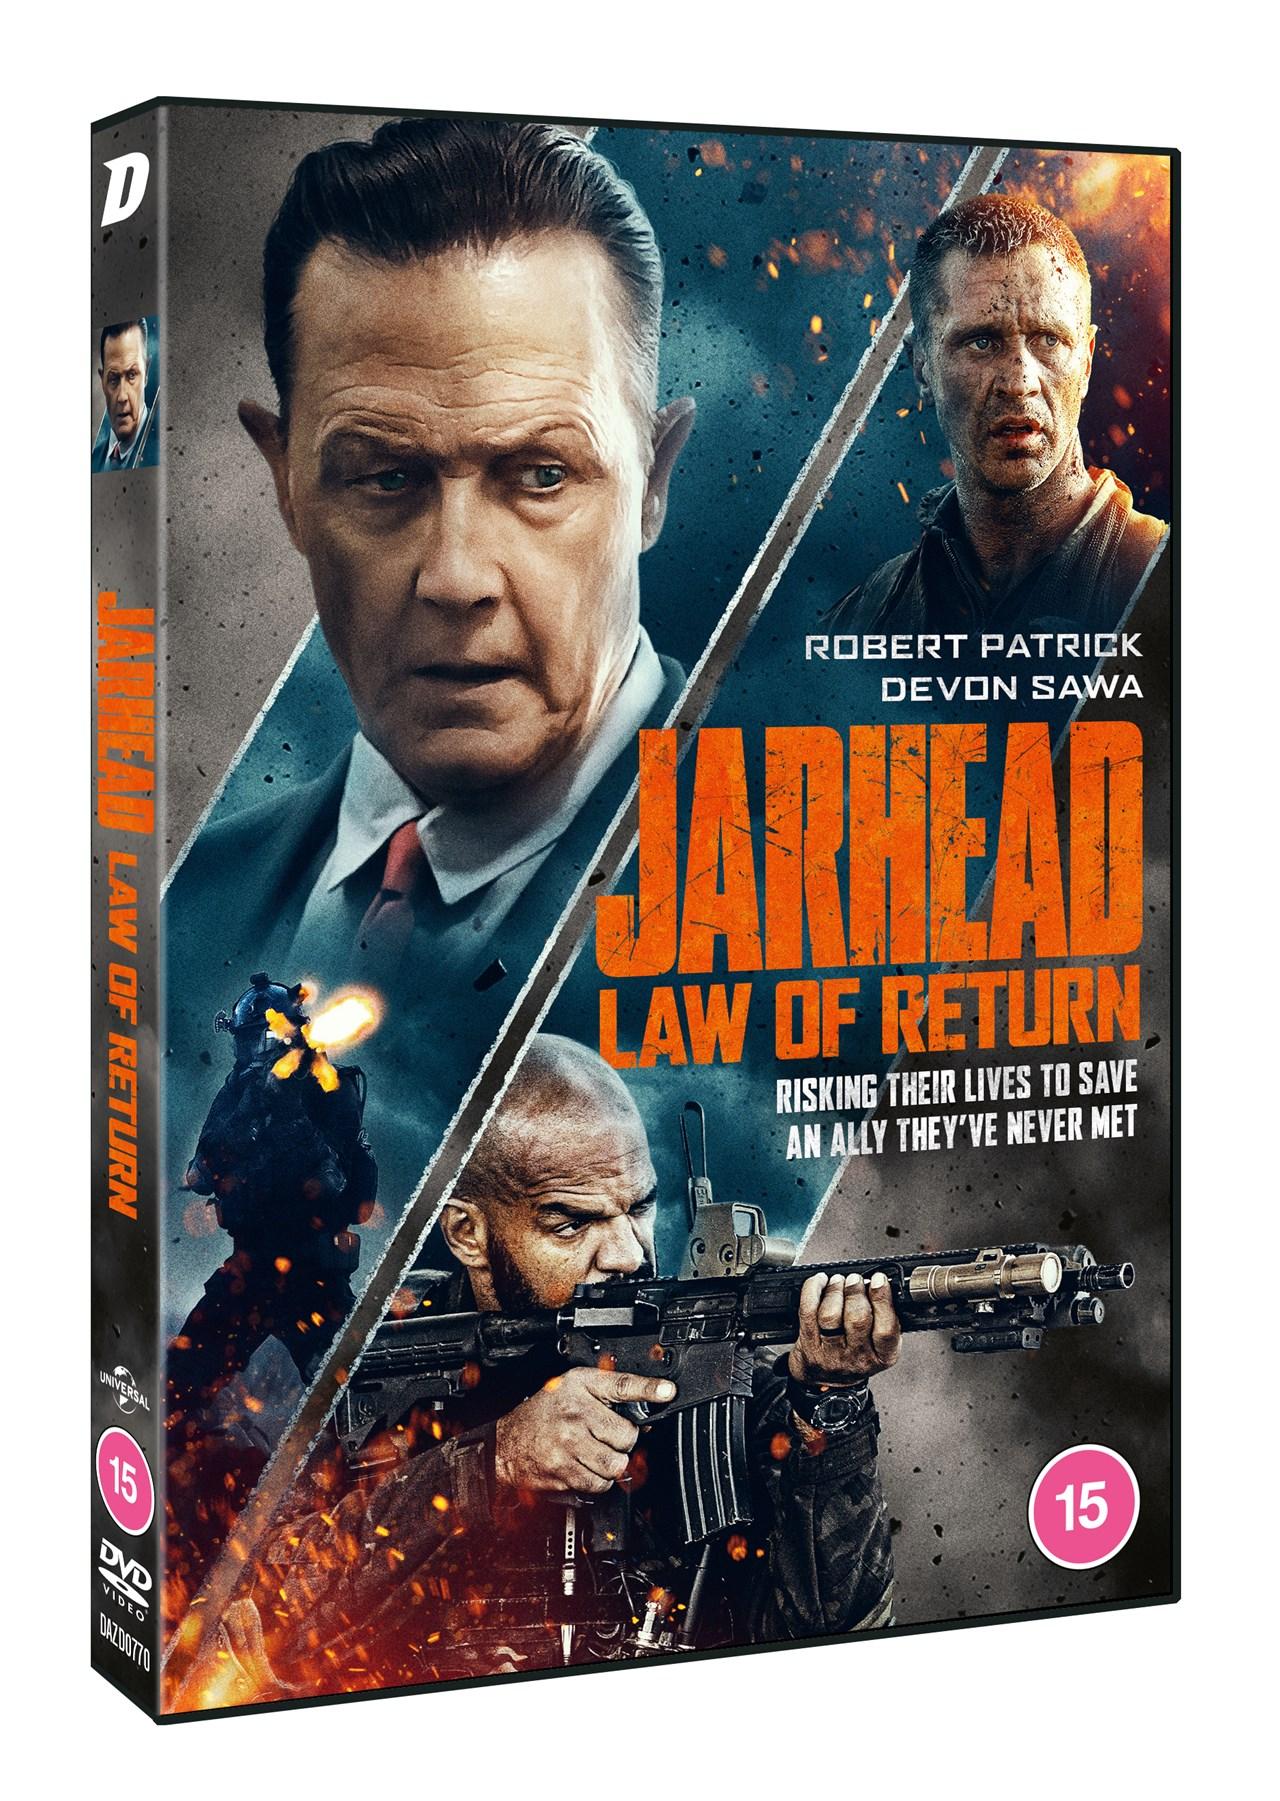 Jarhead: Law of Return - 2